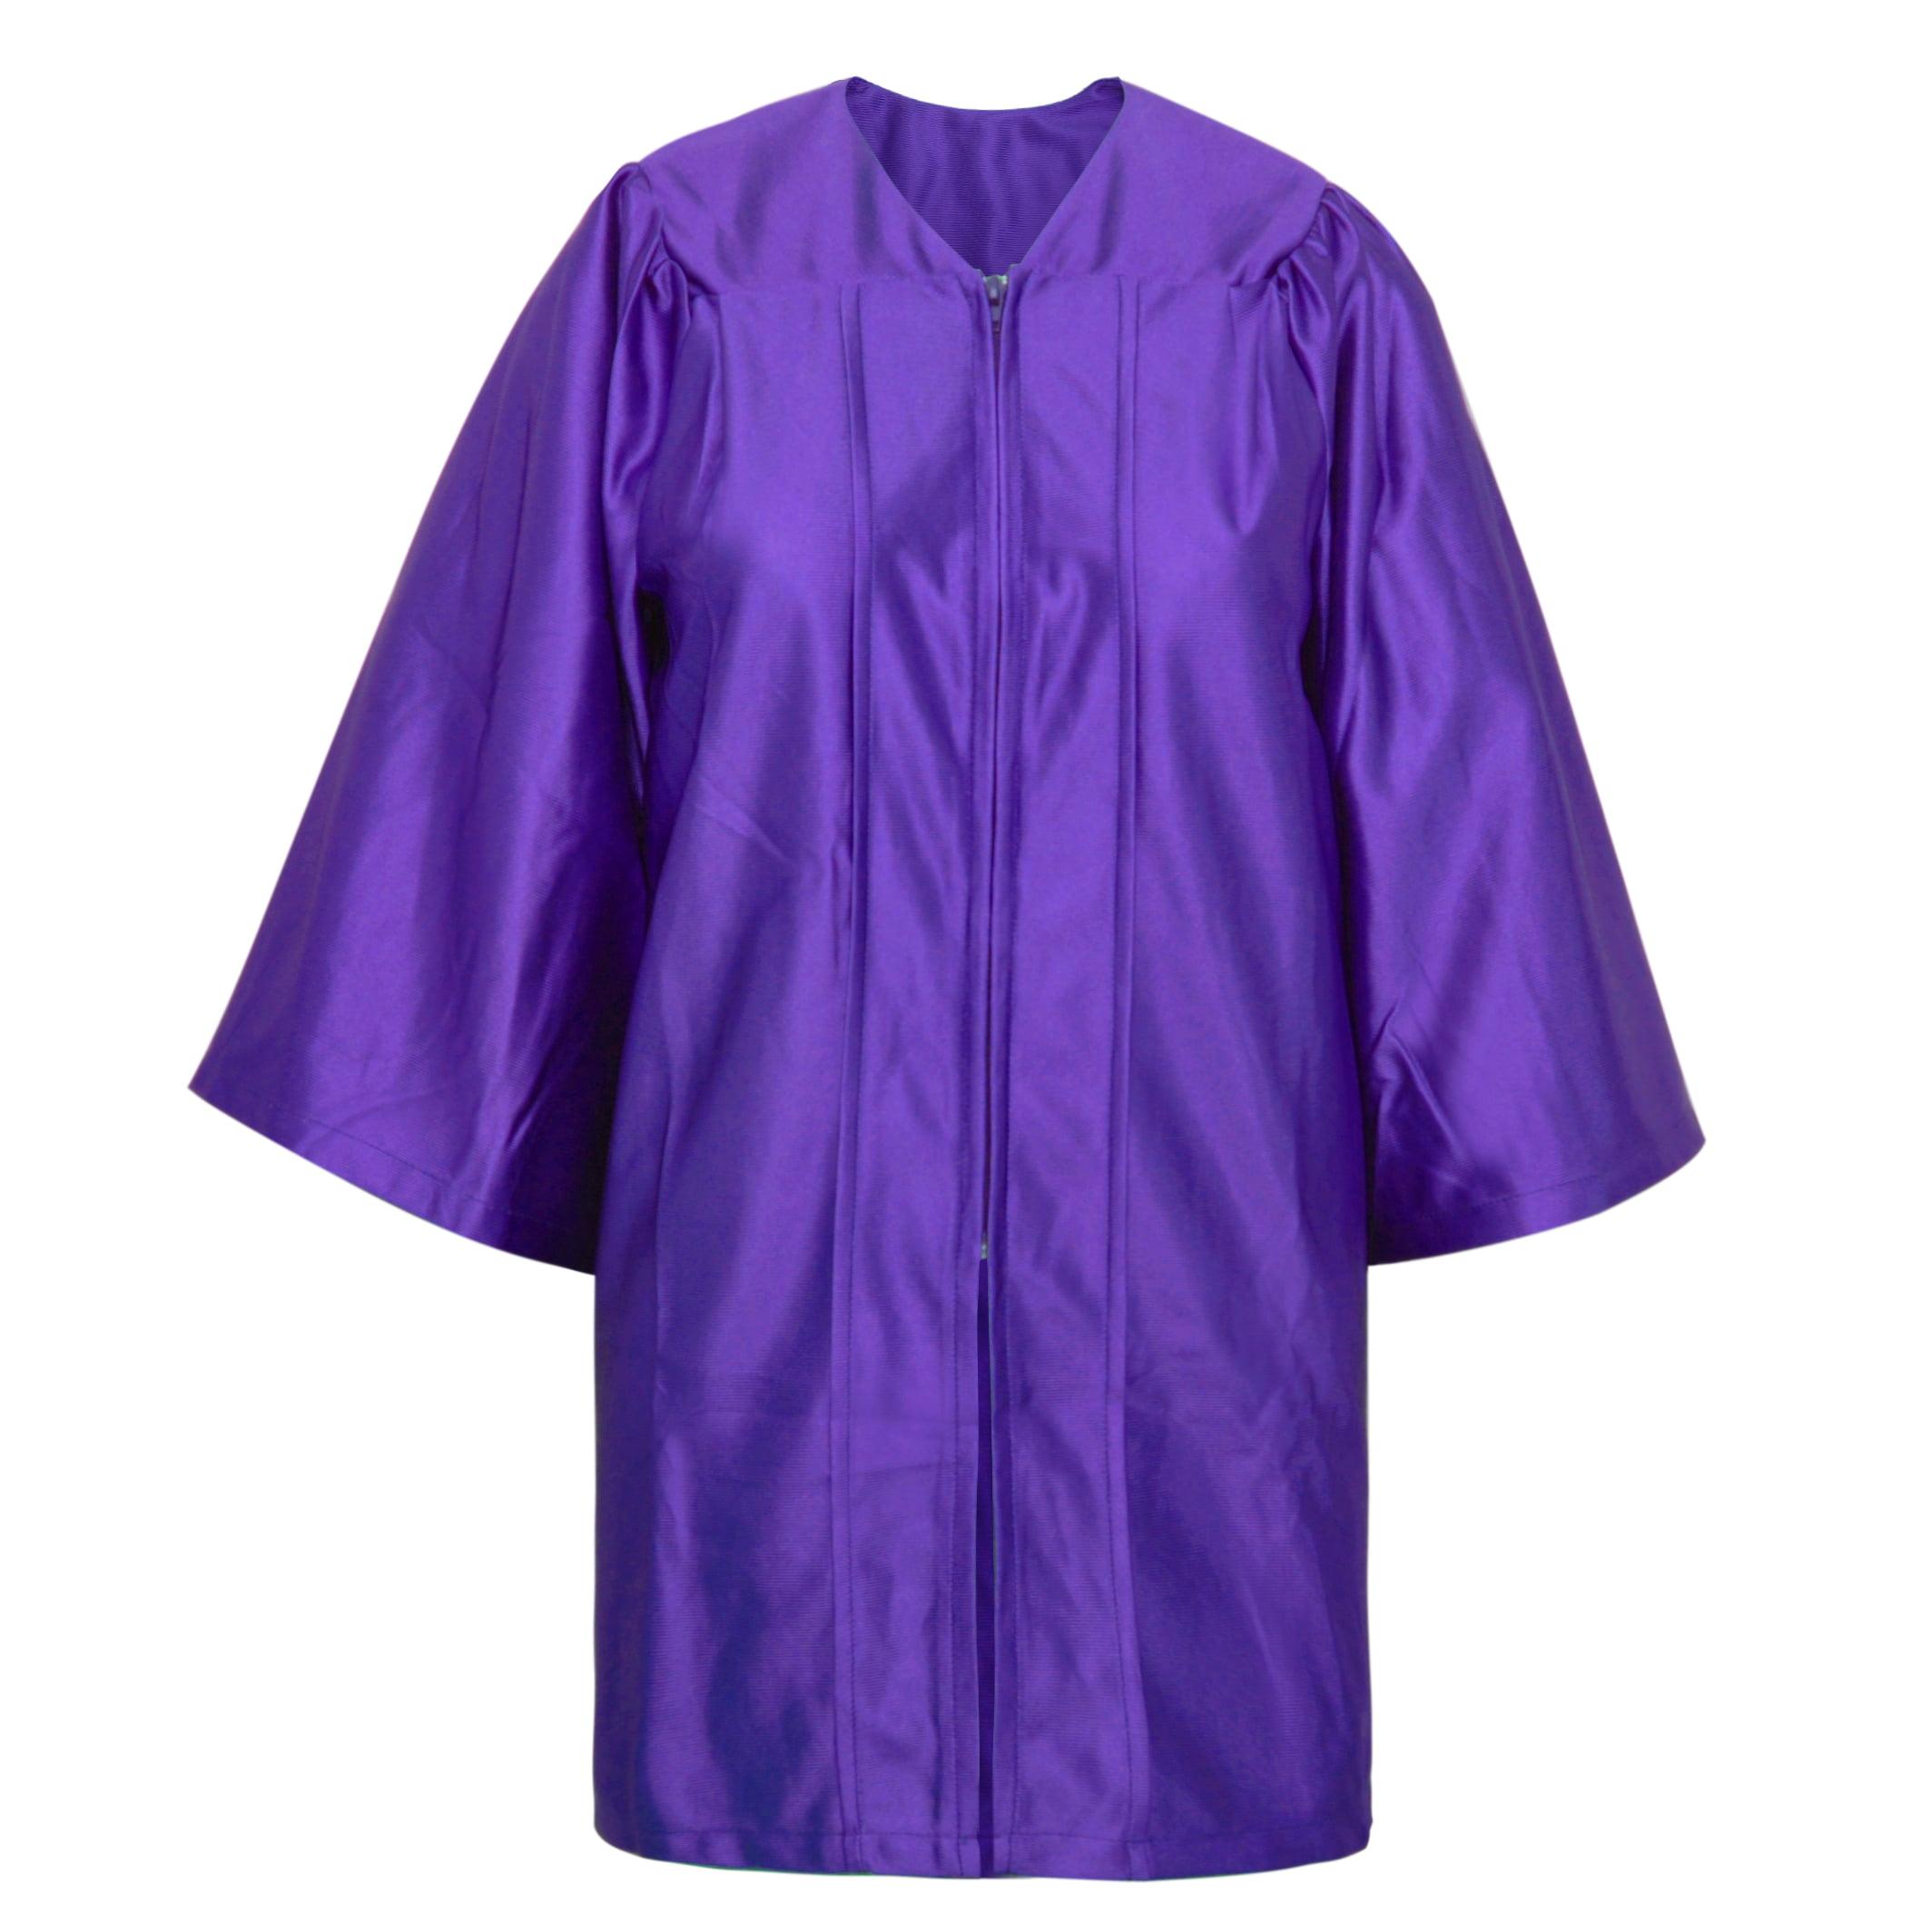 Toptie Toptie Unisex Kindergarten Kids Graduation Gown Choir Robe Purple Walmart Com Walmart Com